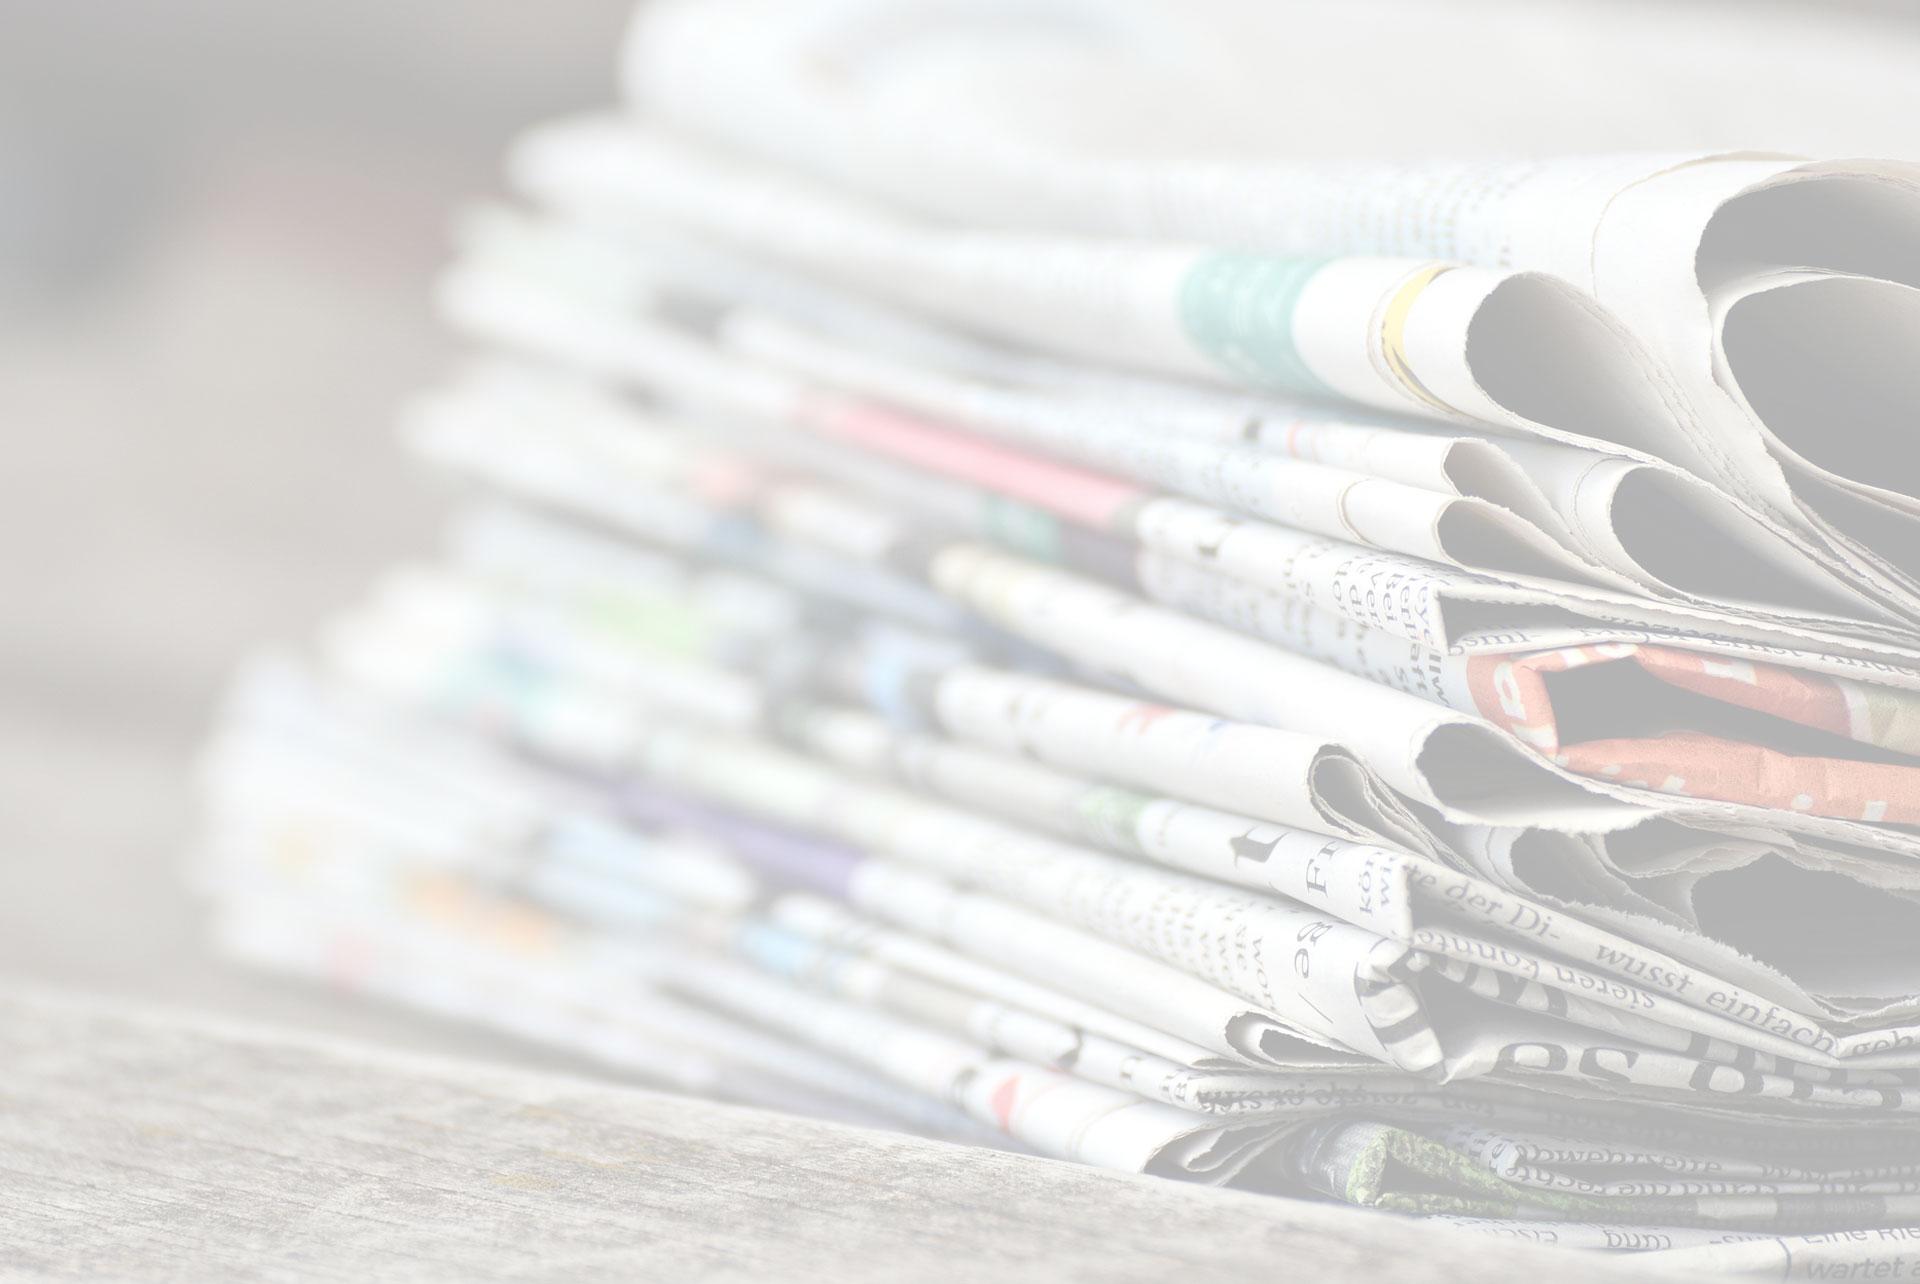 Lucca Comics